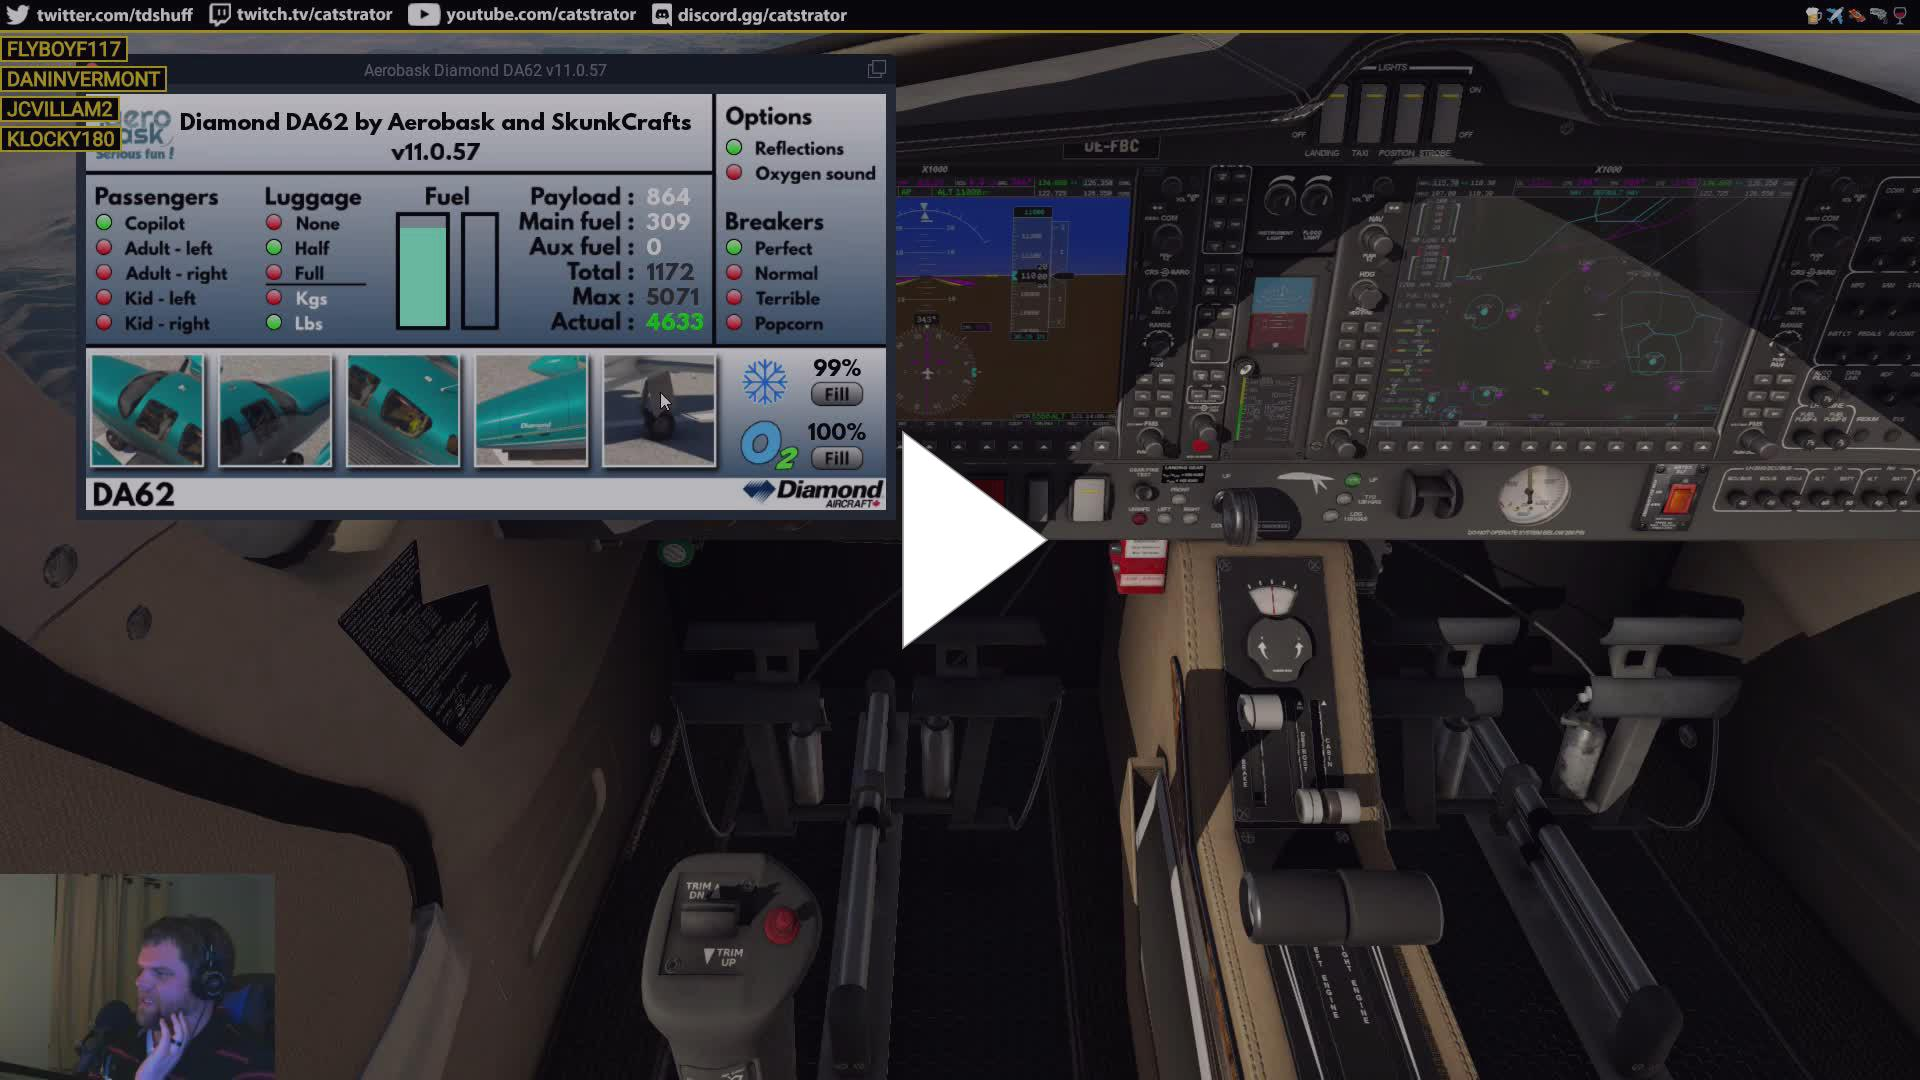 catstrator - The Griswald Family Plane | Aerobask Diamond DA-62